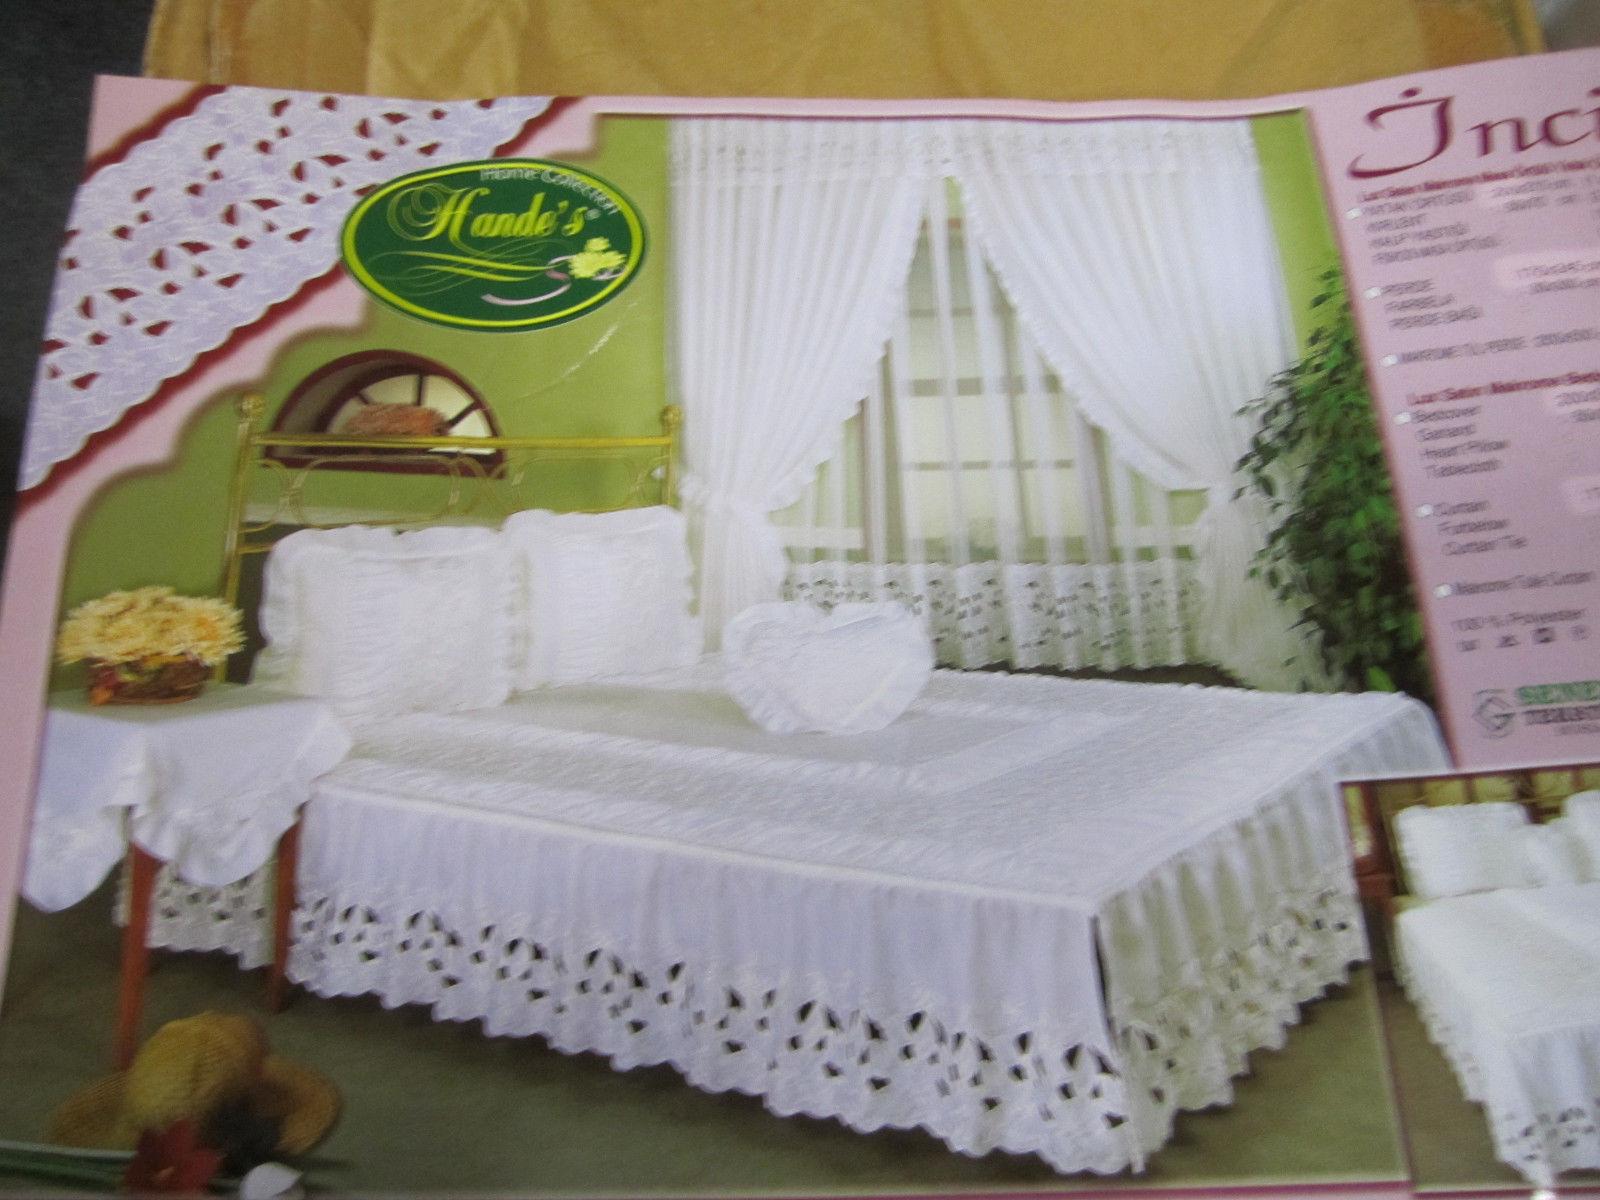 Schlafzimmer Set Mit Gardinen Blau Bettdecke +Kissenbezug+Tiscdecke+  Gardinen 1 ...